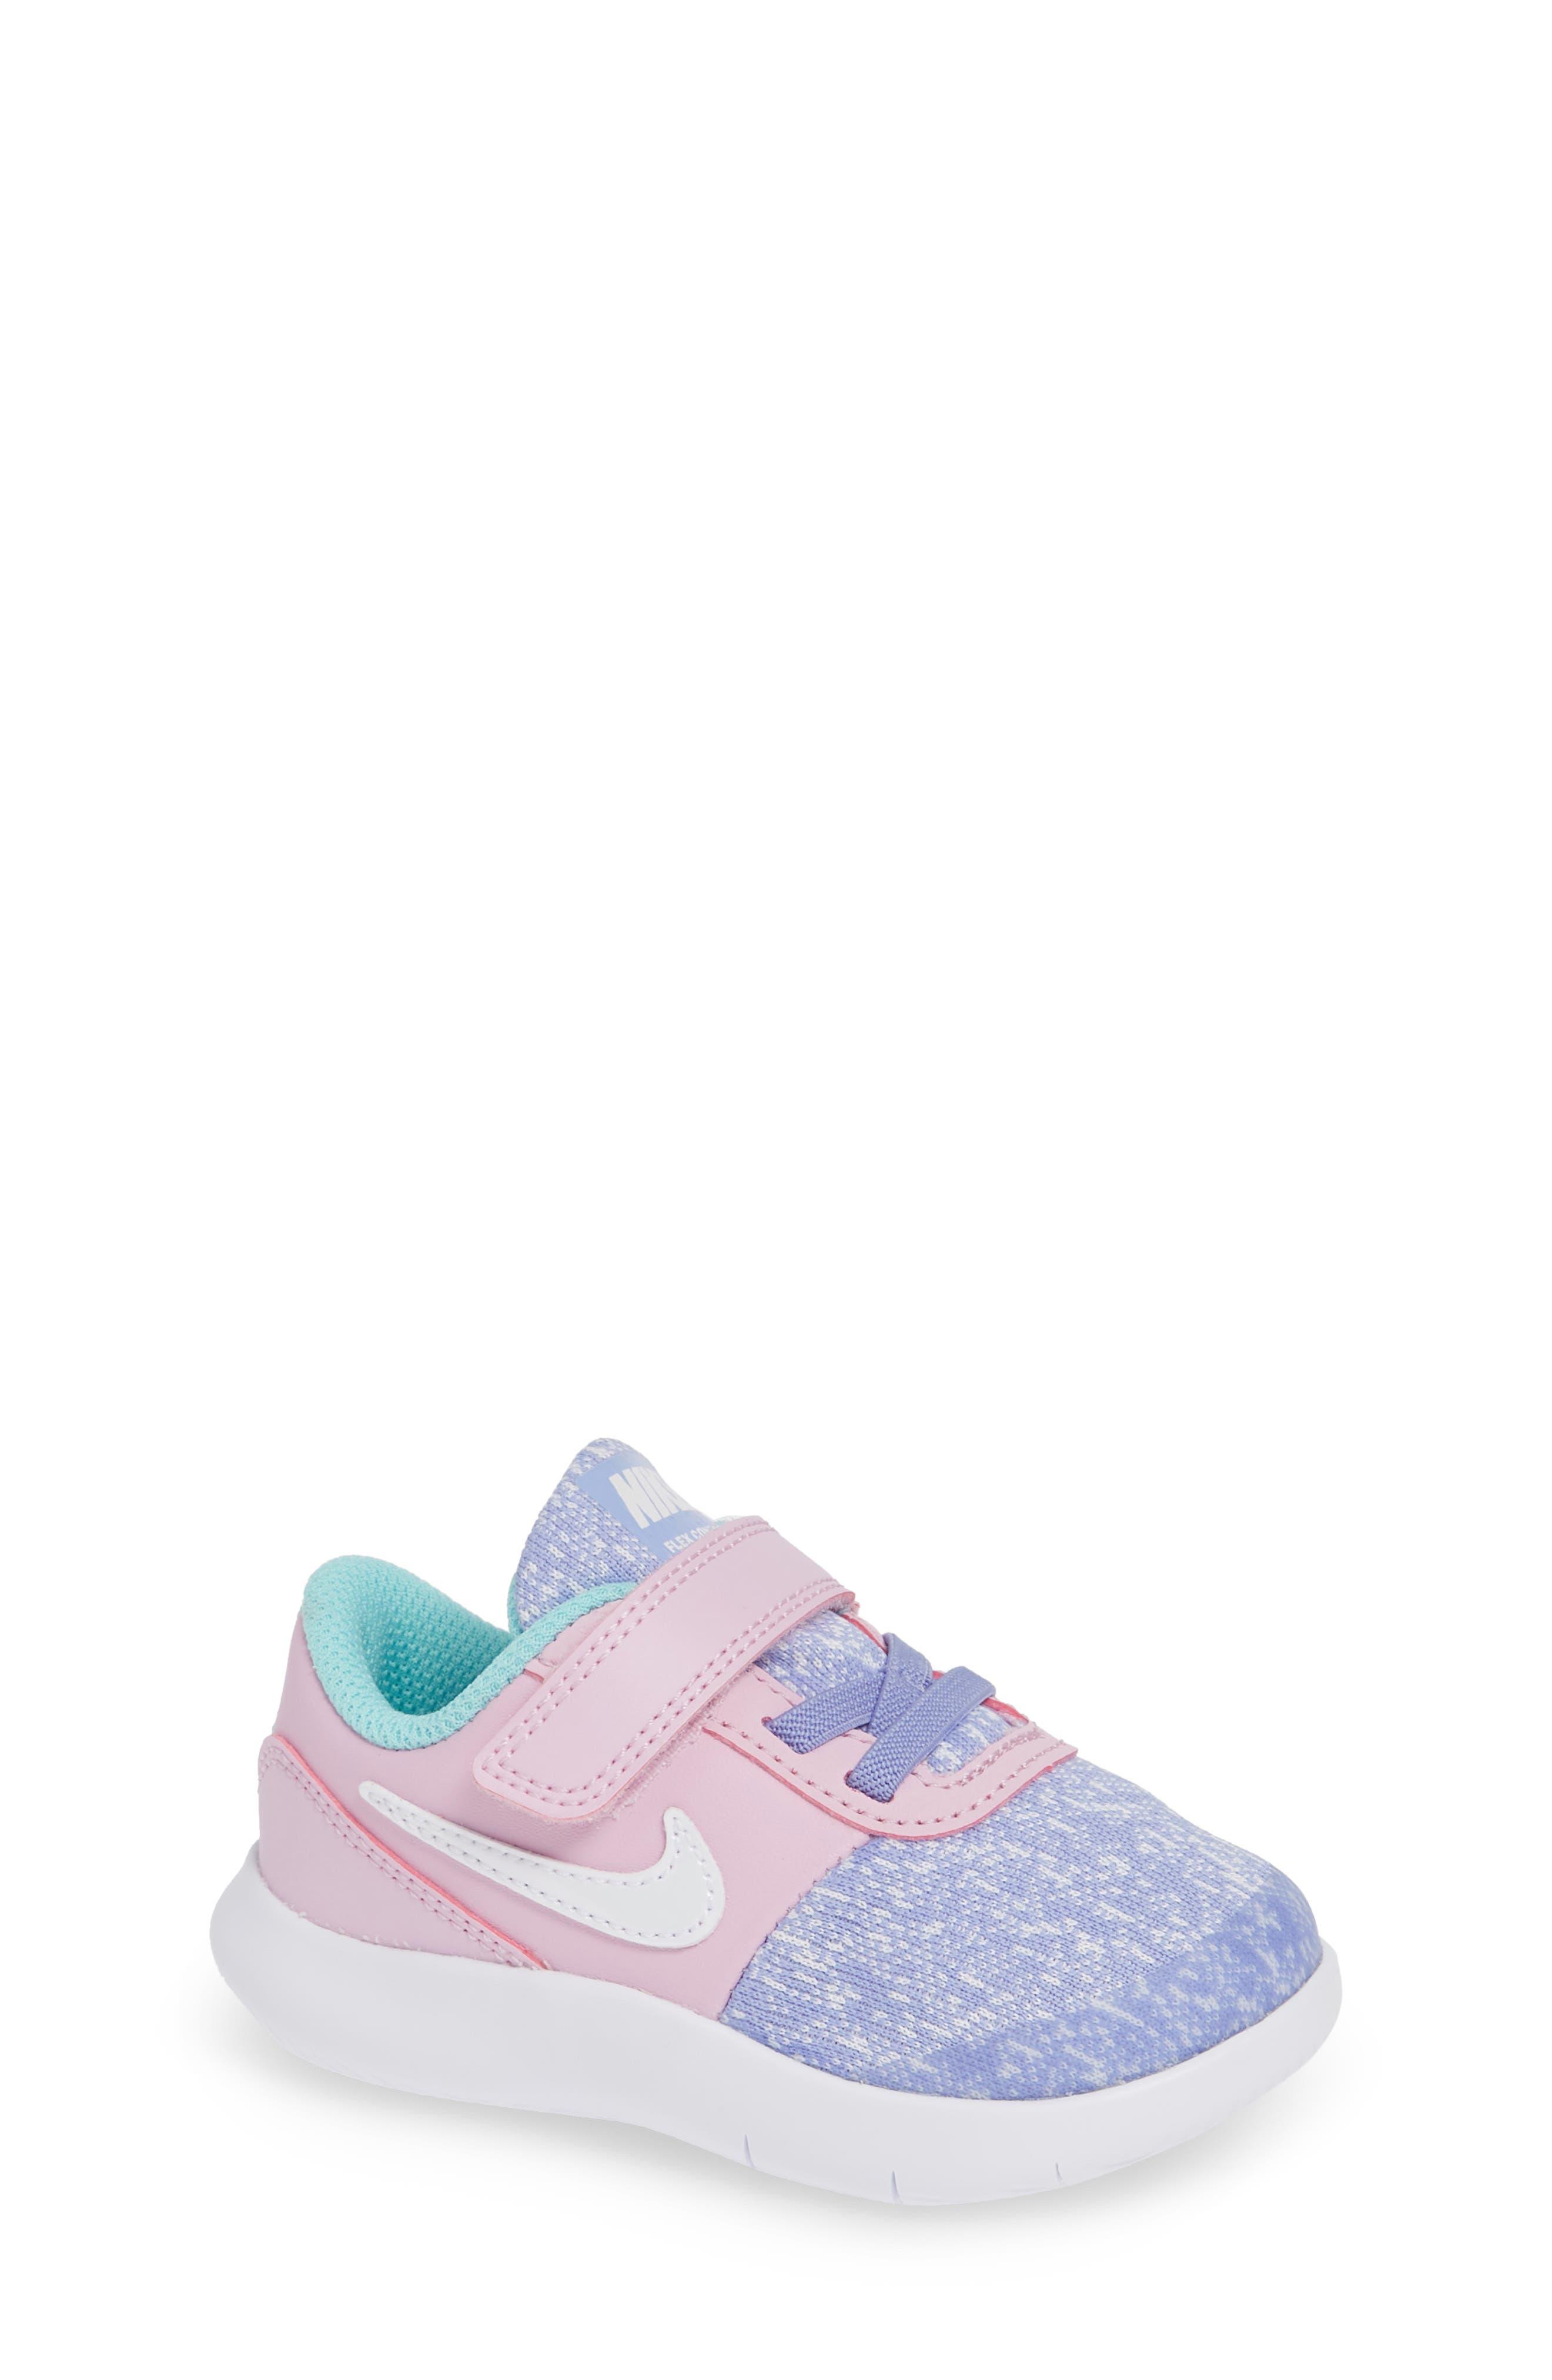 Flex Contact Running Shoe,                         Main,                         color, 651